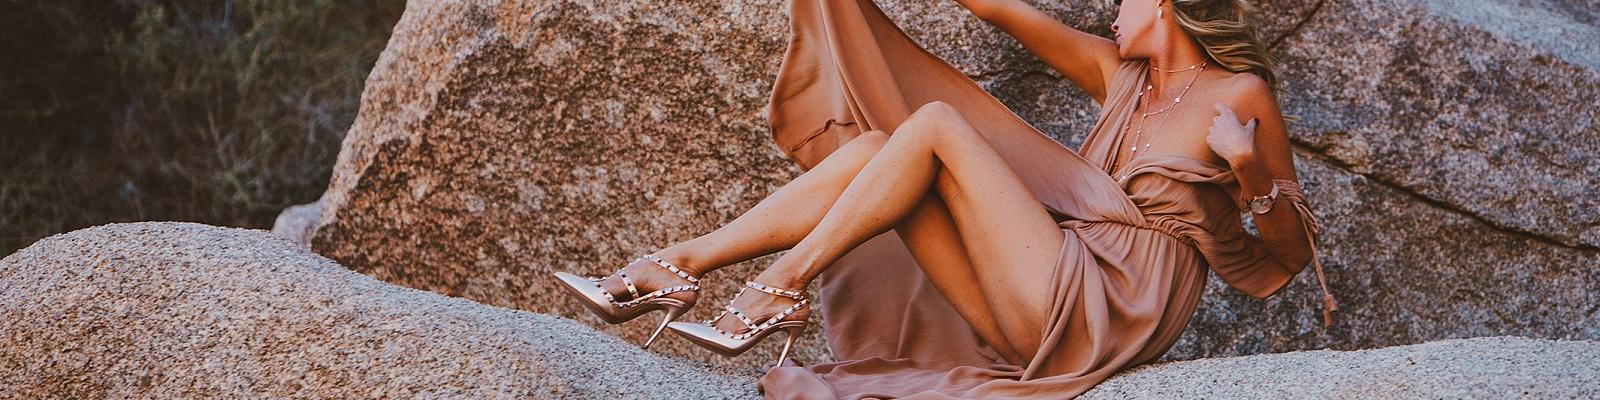 Laila Libertine's Cover Photo